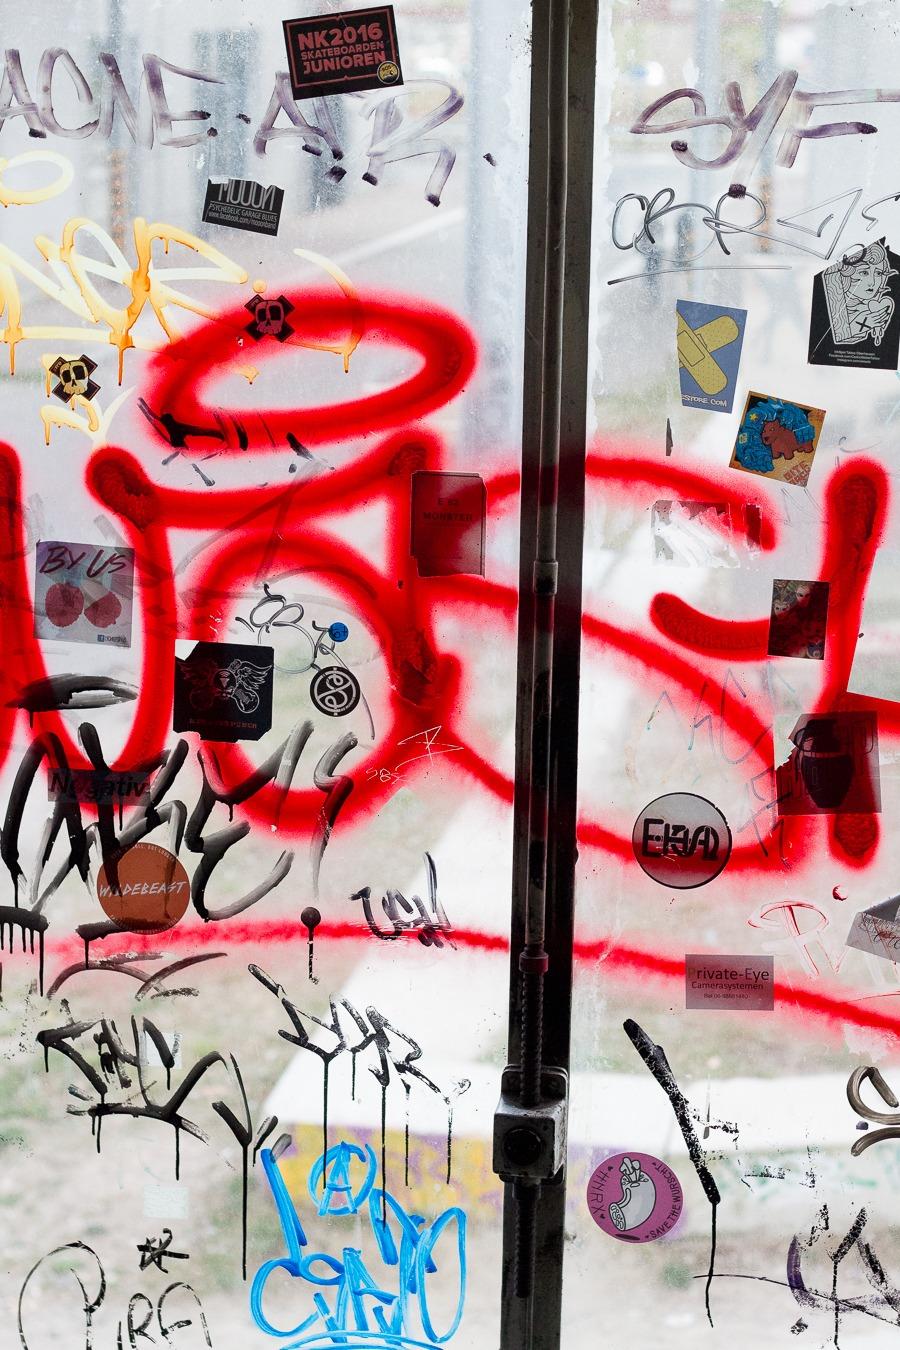 Strijp-S Eindhoven graffiti